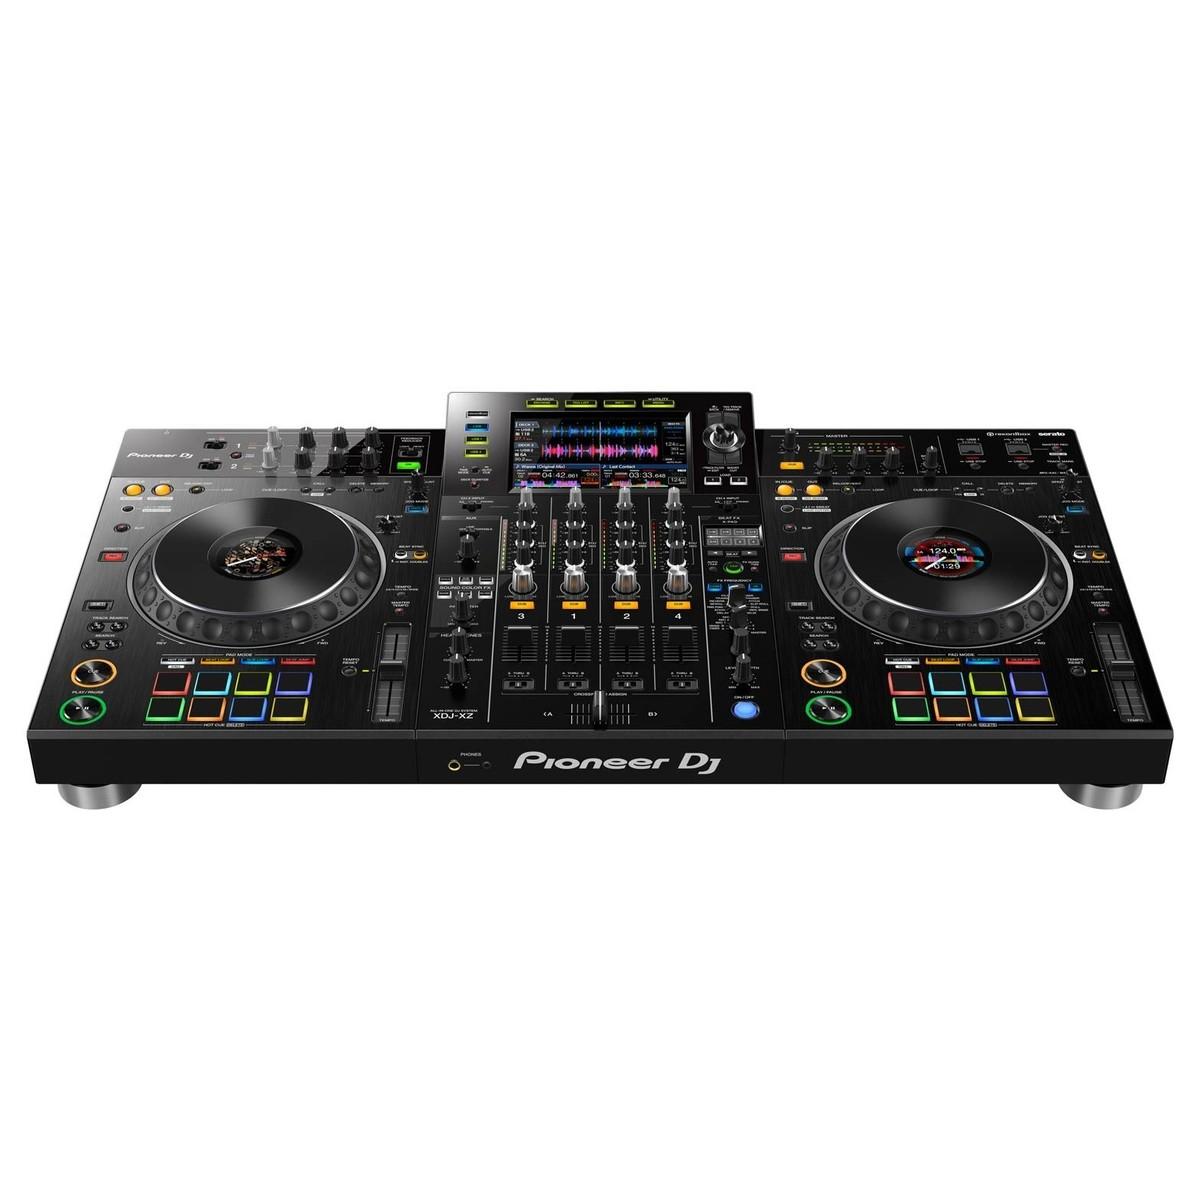 PIONEER XDJ-XZ CONSOLLE PER DJ 4 CANALI INTERFACCIA USB CONTROLLER DJ LINK 3